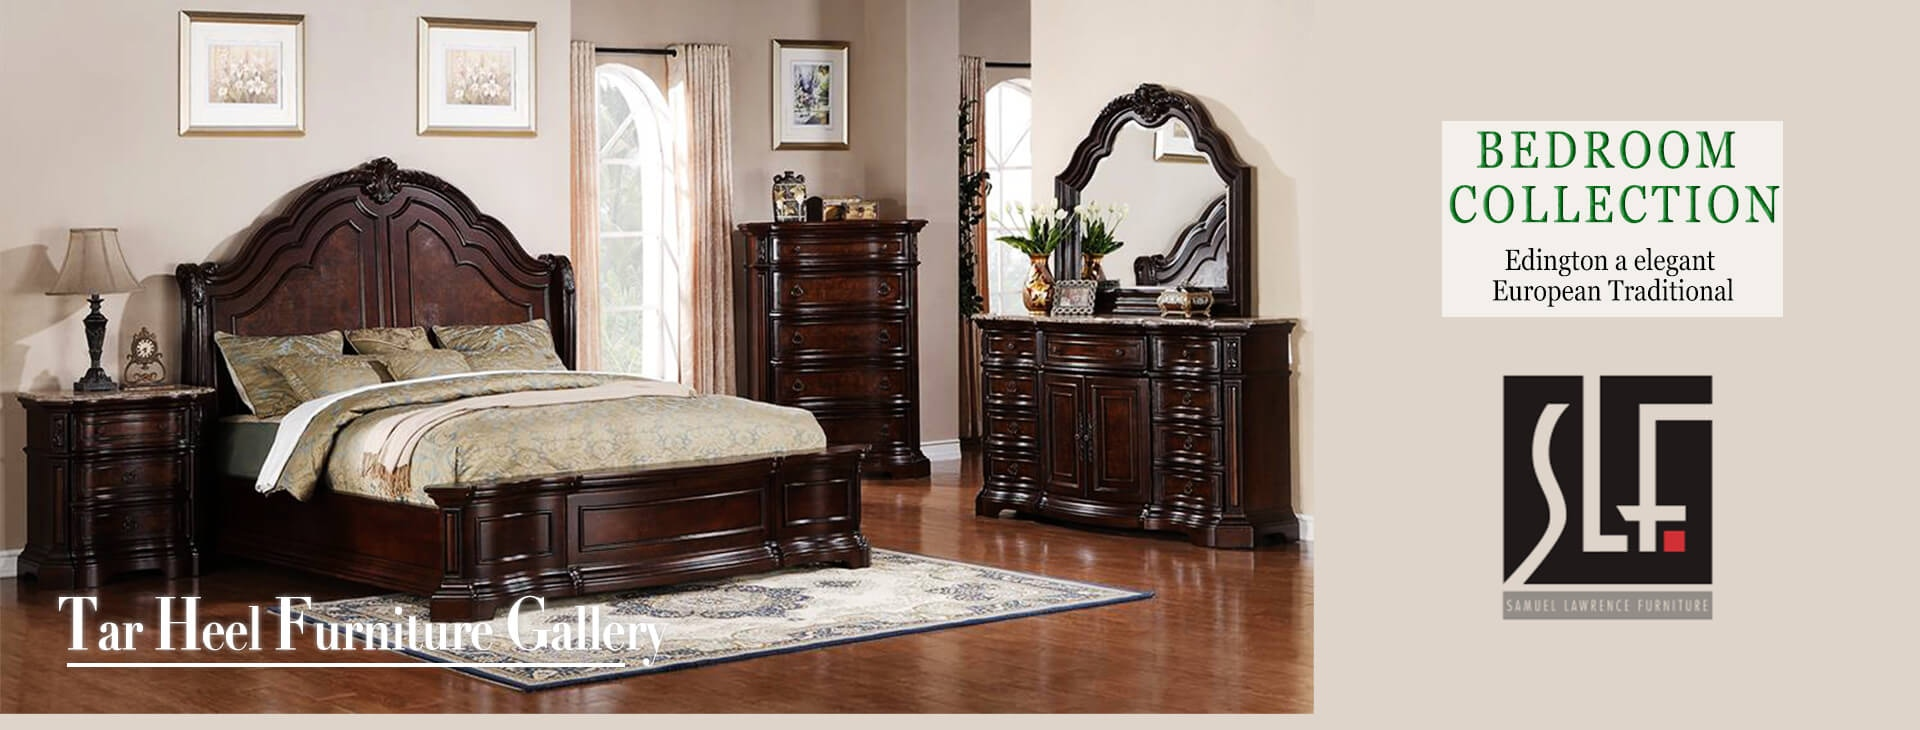 Bedroom - Tar Heel Furniture Gallery - Fayetteville, NC